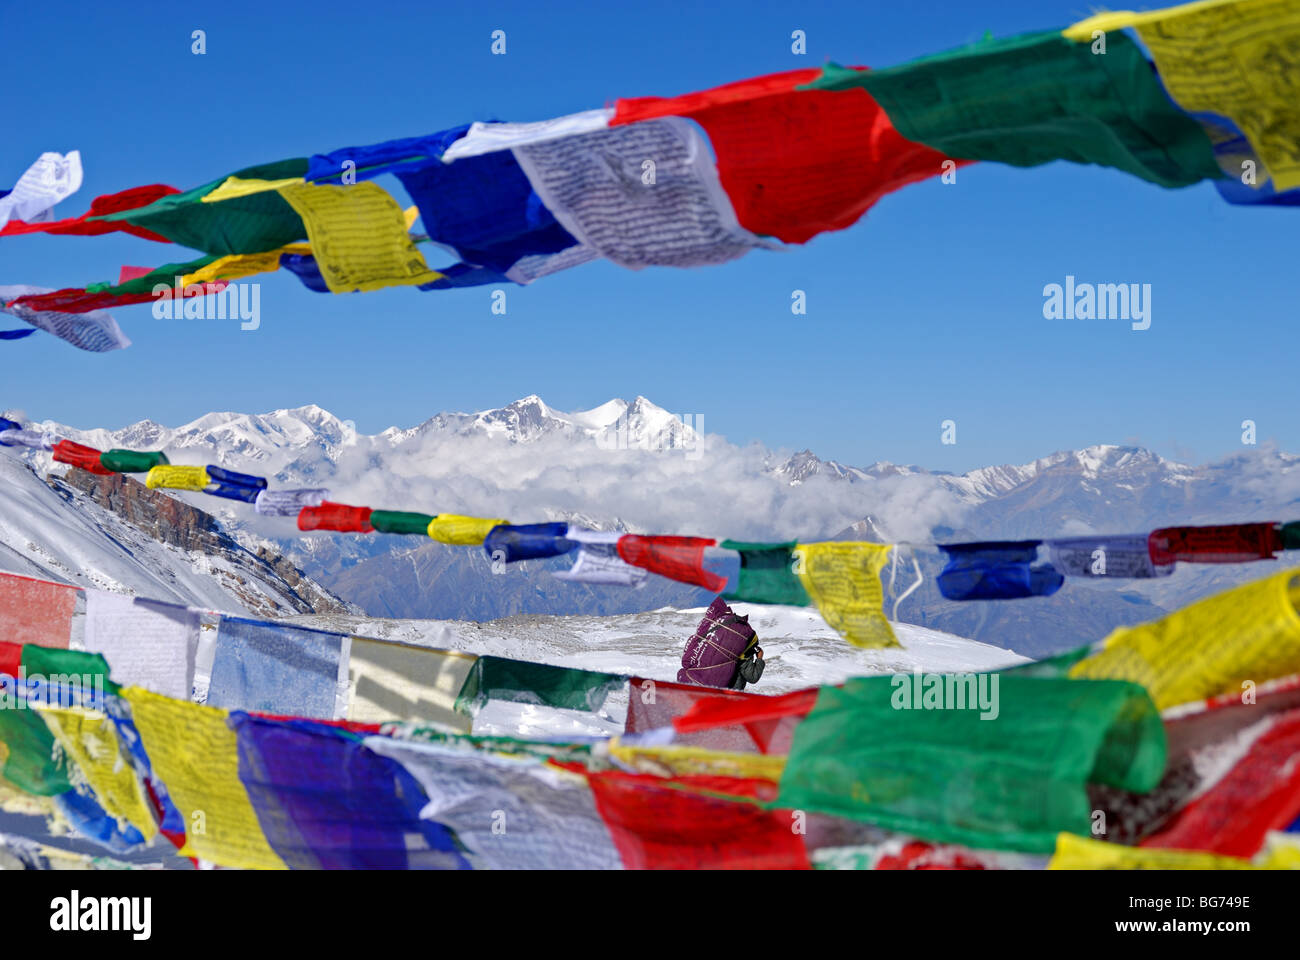 Hiking.Himalayas,Nepal,trekking,Backpacking, Himalaya trekking, Nepal trekking, Annapurna trekking, Annapurna, Nepal - Stock Image